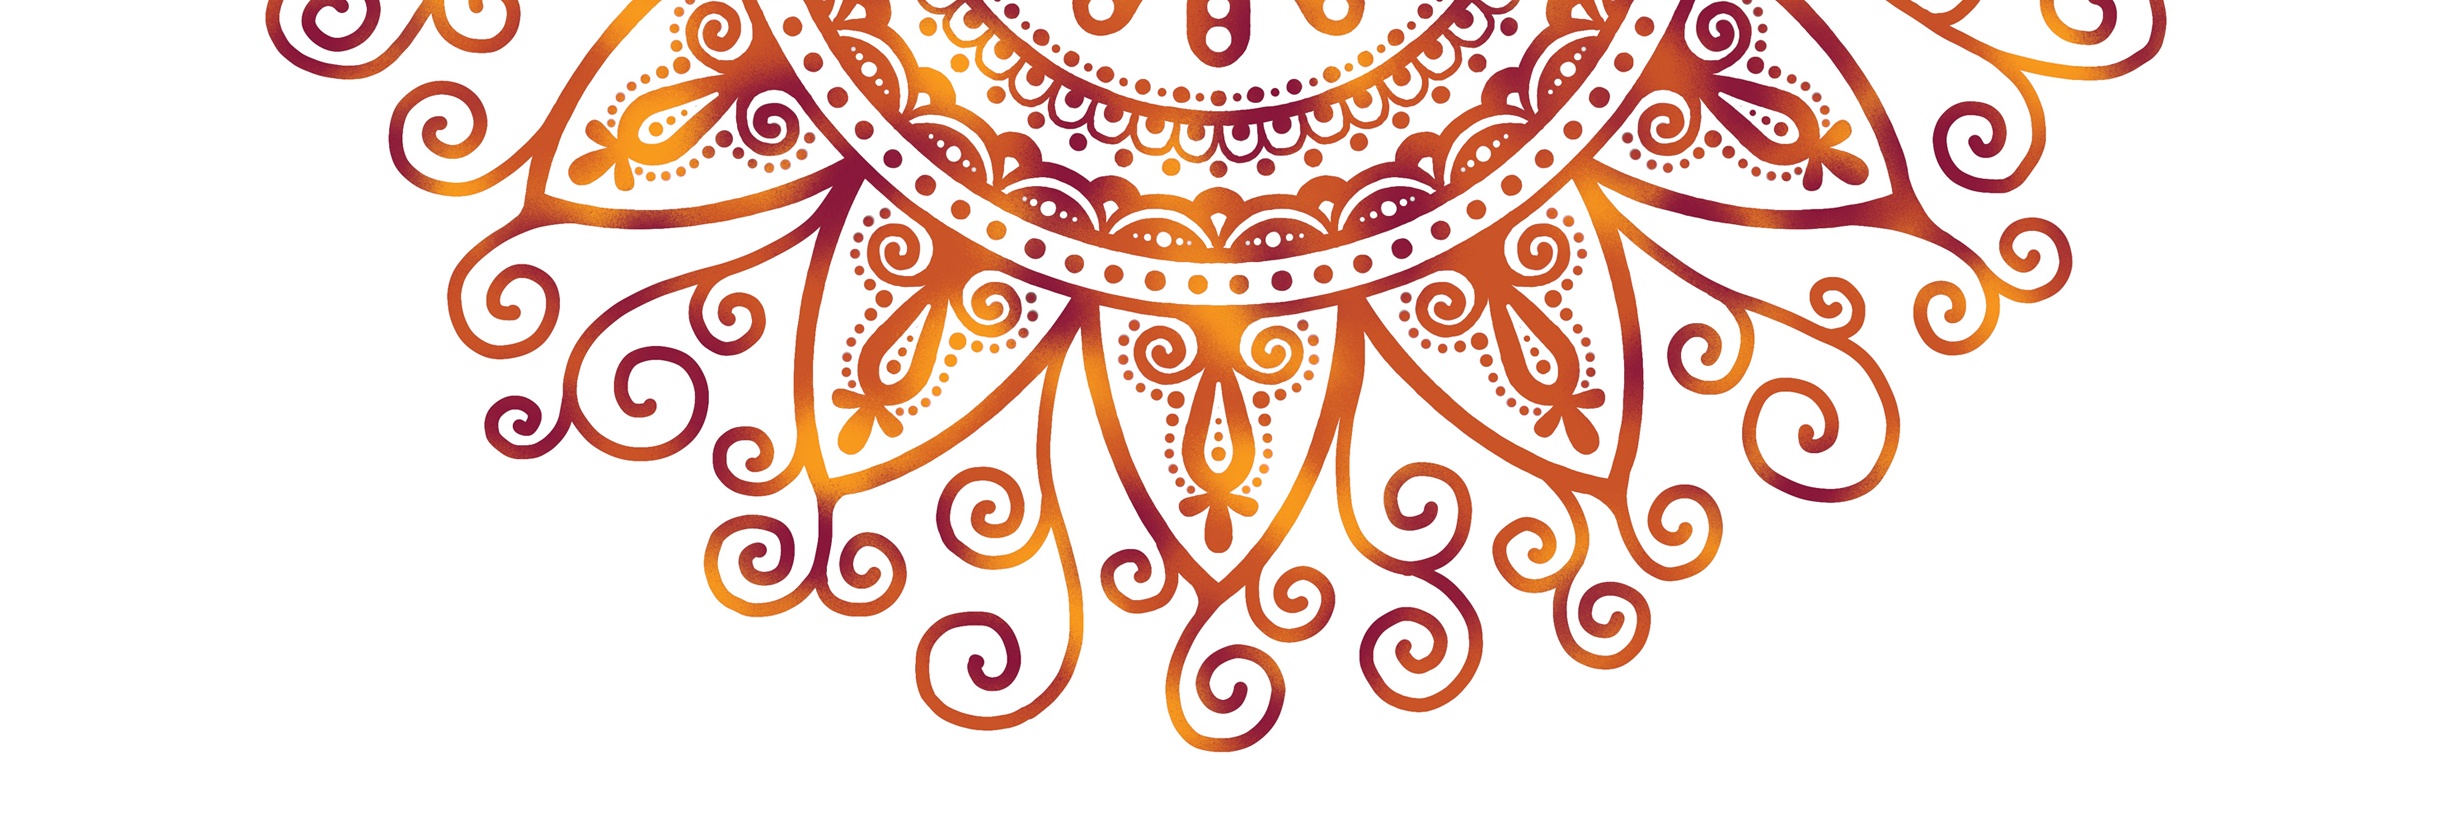 Mandala disegnato a mano.